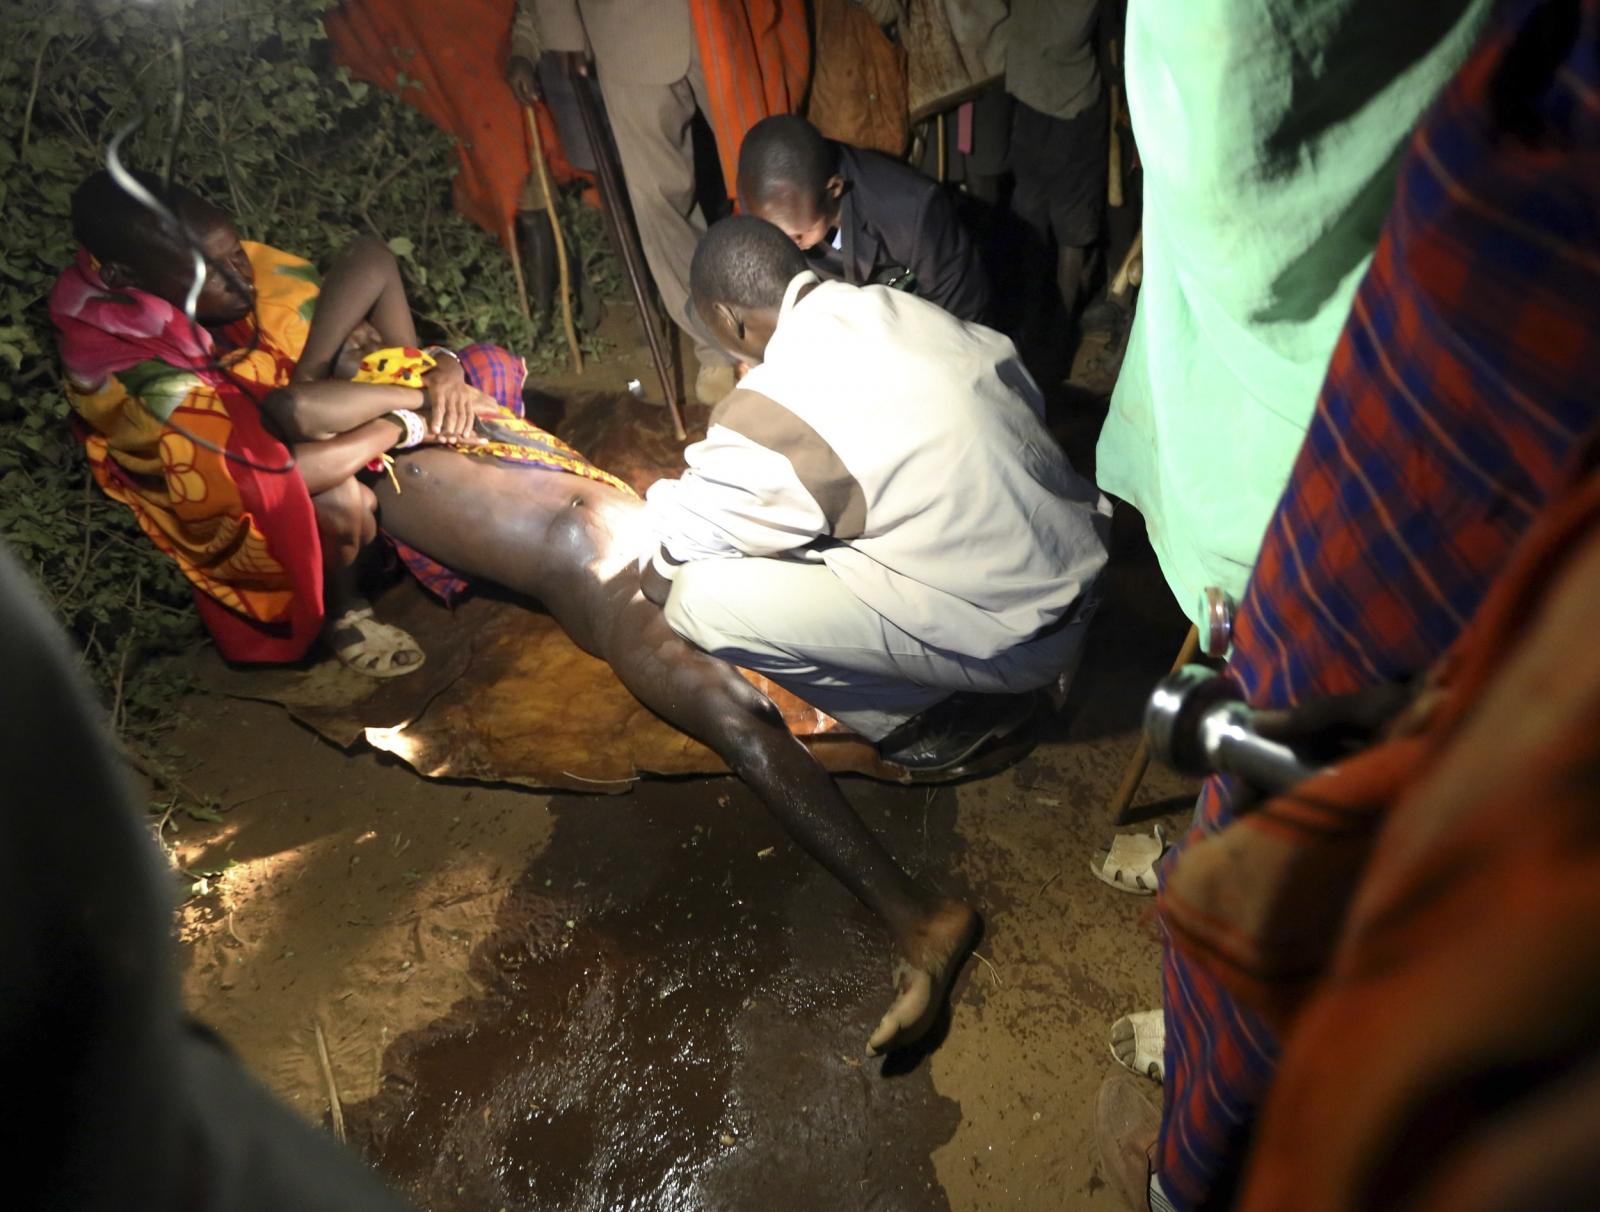 Kenya circumcision season